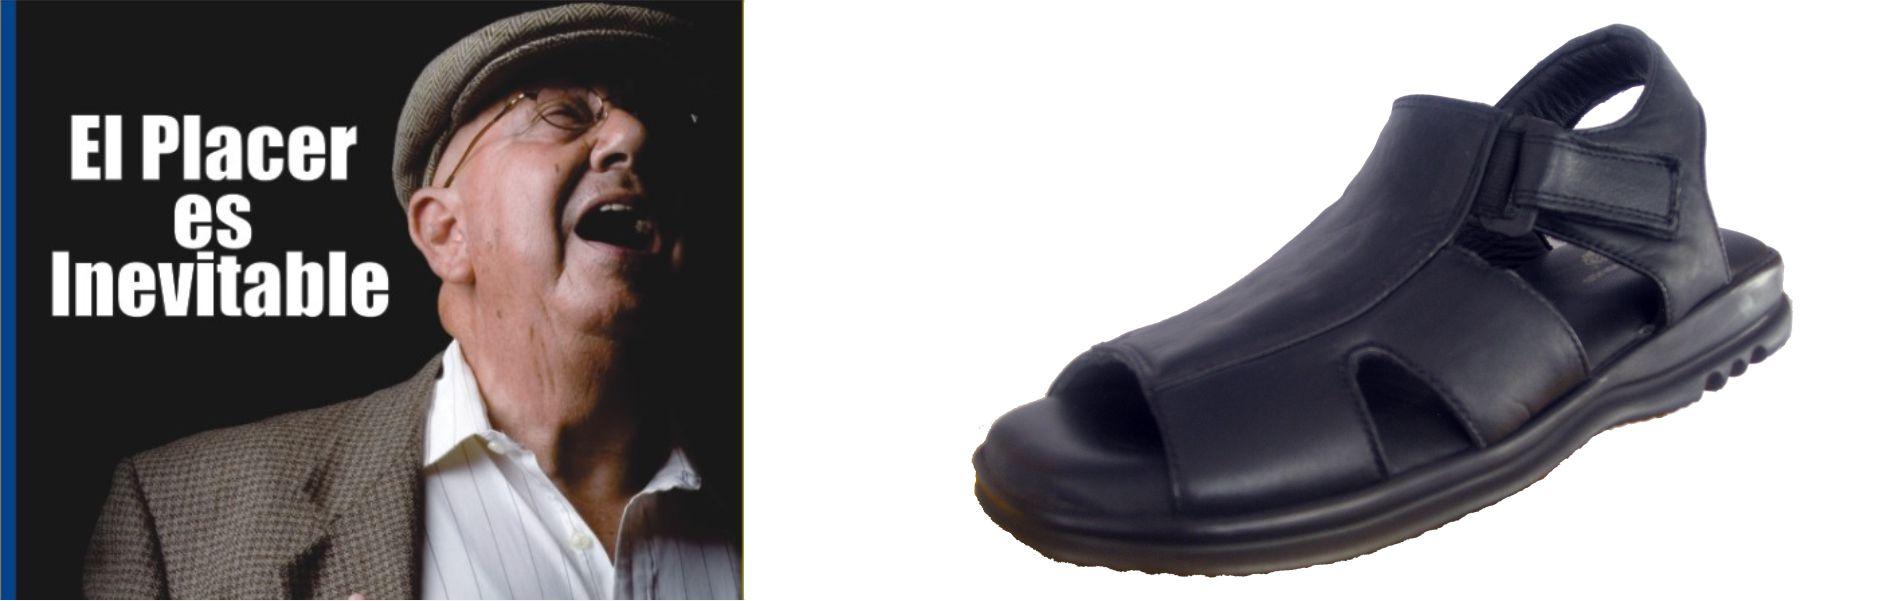 Zapato Guante Un Modelo a tu Necesidad